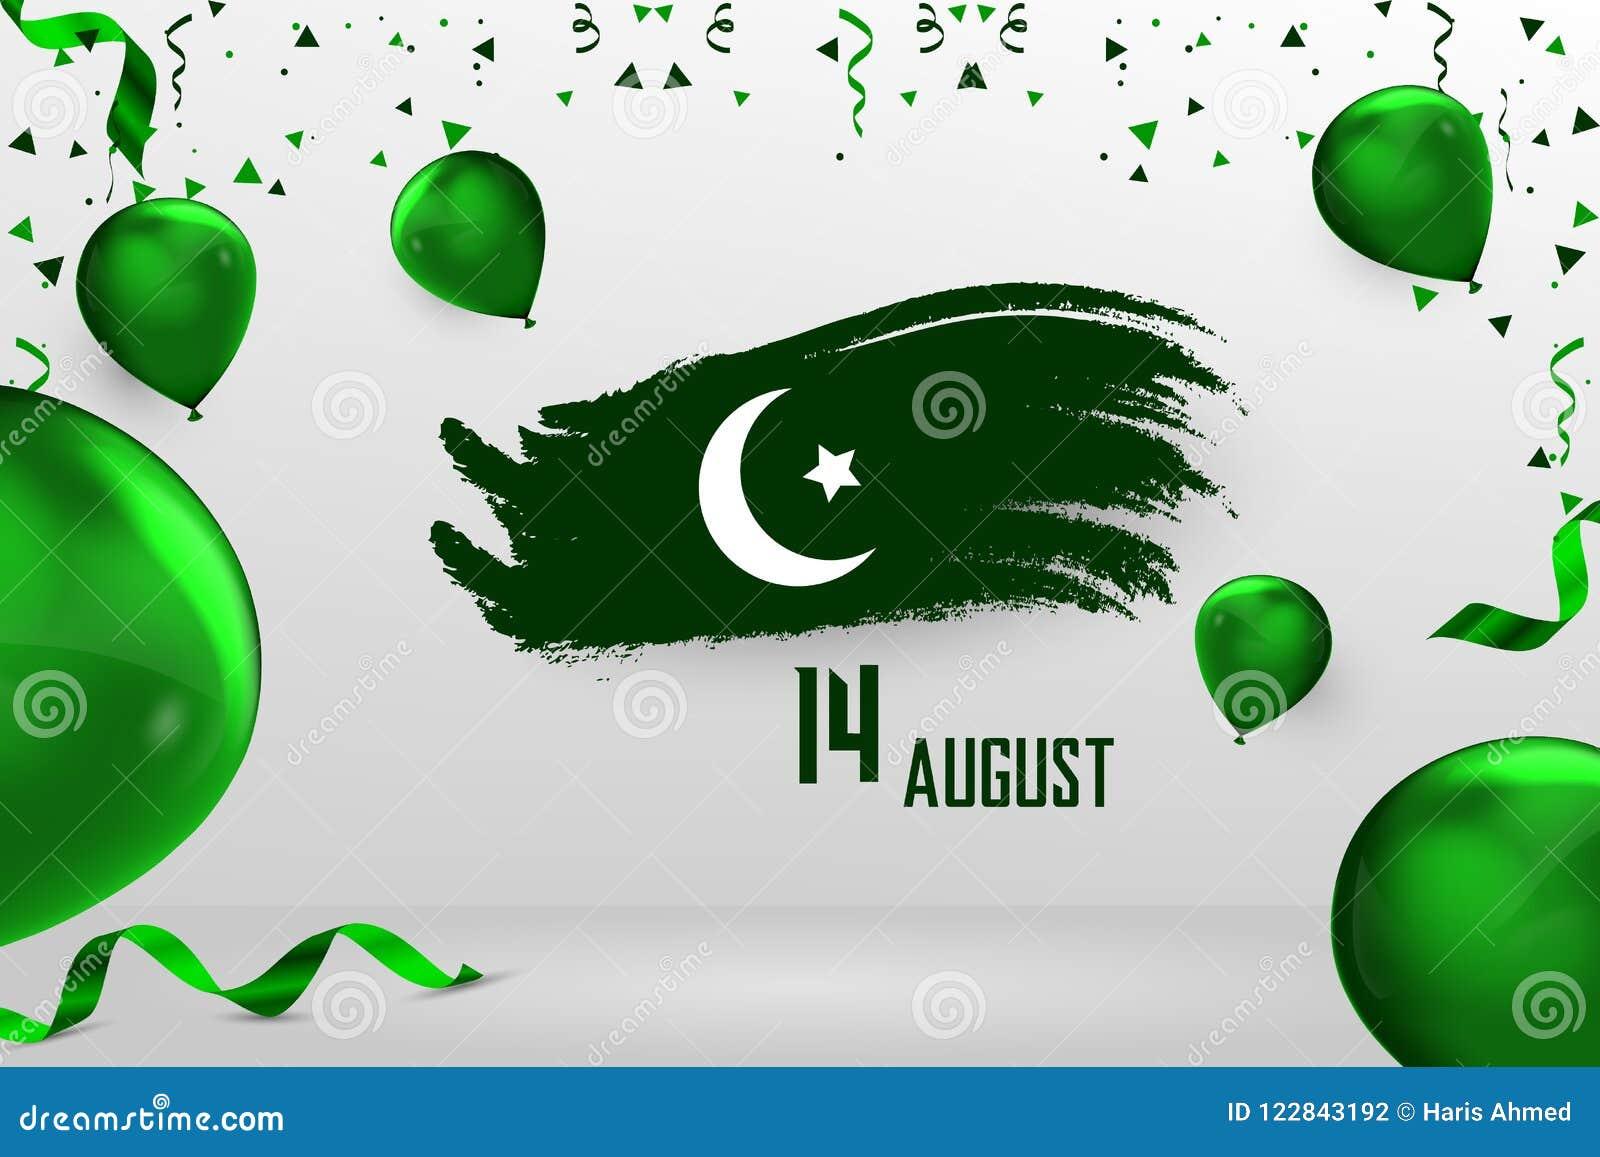 Happy Independence Day Pakistan, 14 August Pakistani